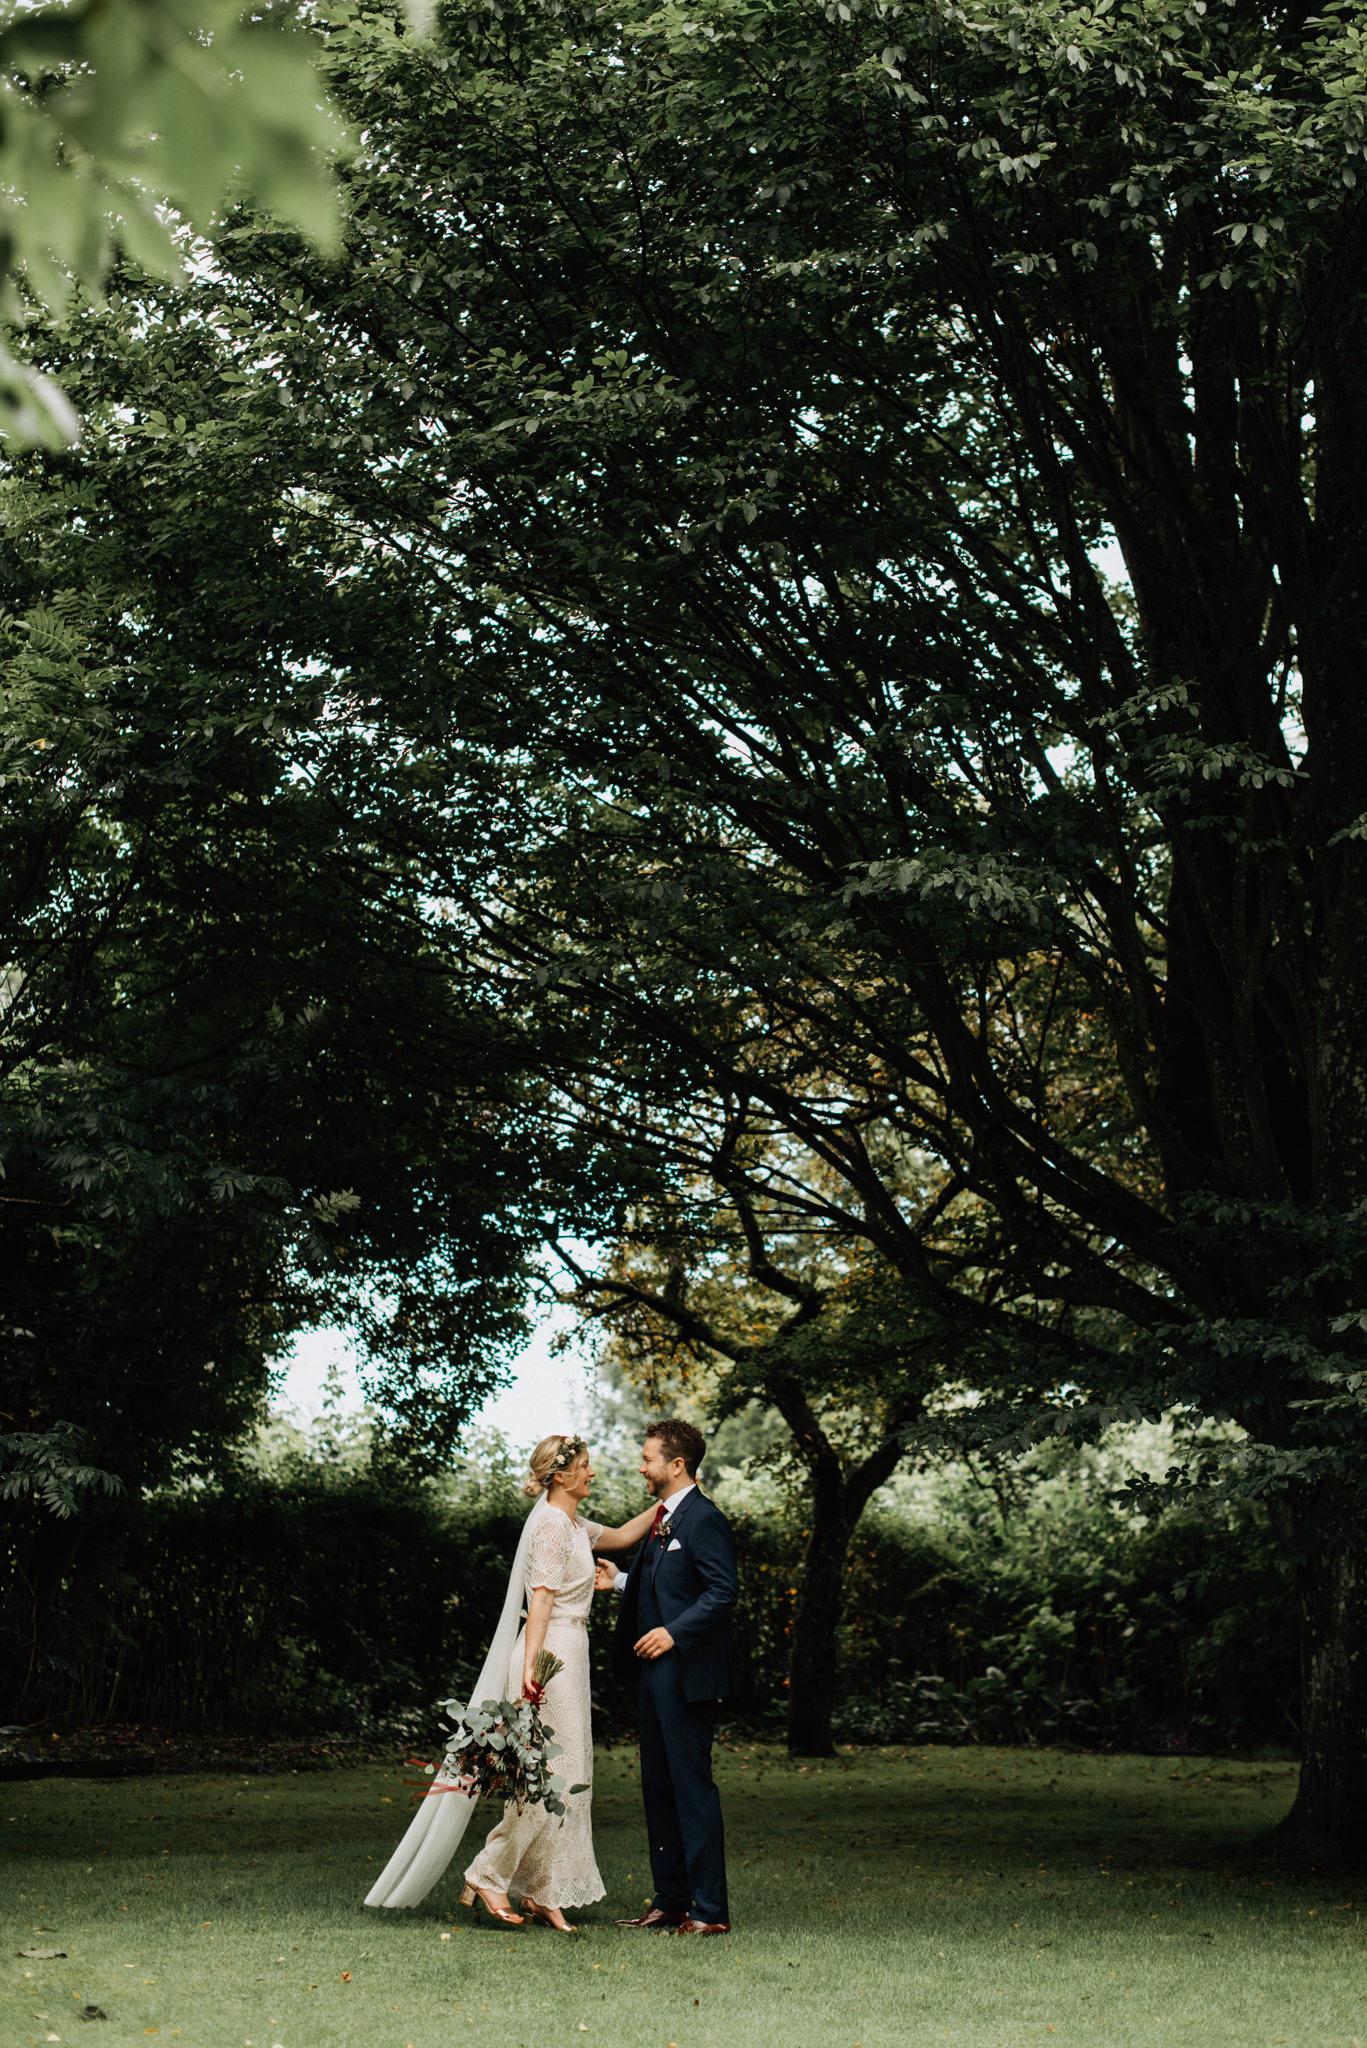 bohemiskt-bröllop-på-nygård-event-i-åstorp-bröllopsfotograf-skåne-105.jpg